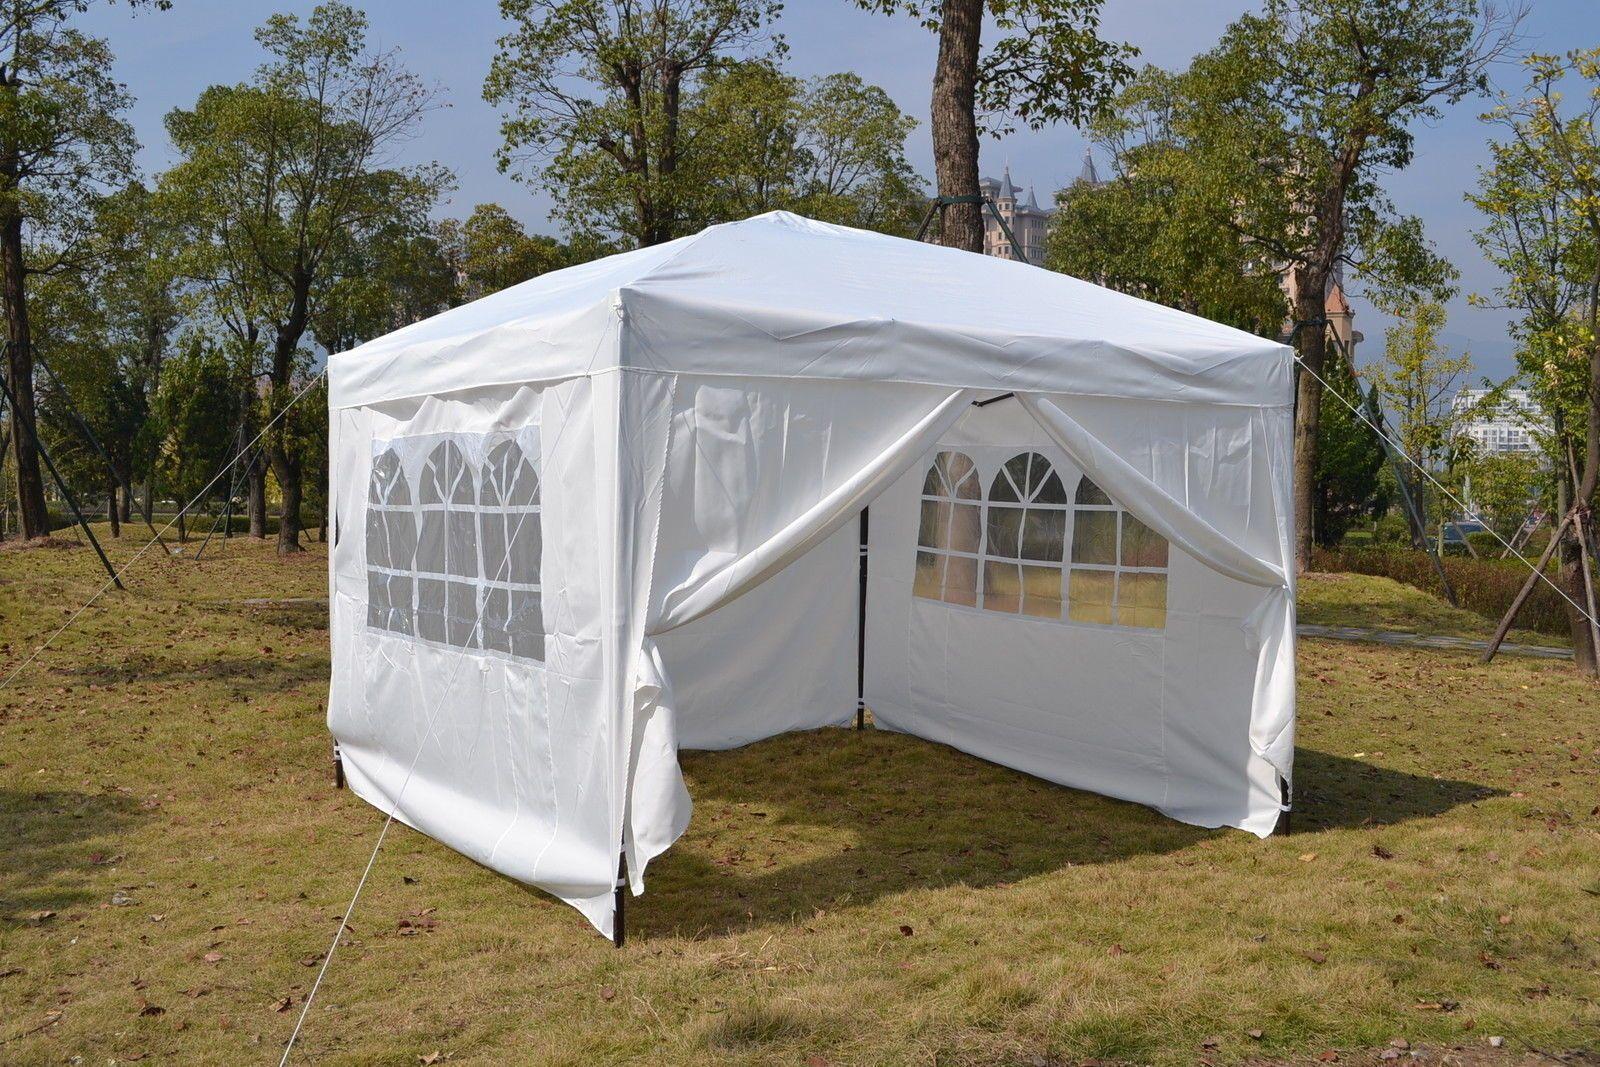 Mcombo 10x10 10x20 Ez Pop Up Wedding Party Tent Folding Gazebo Canopy W Sides Gazebo Tent Party Tent